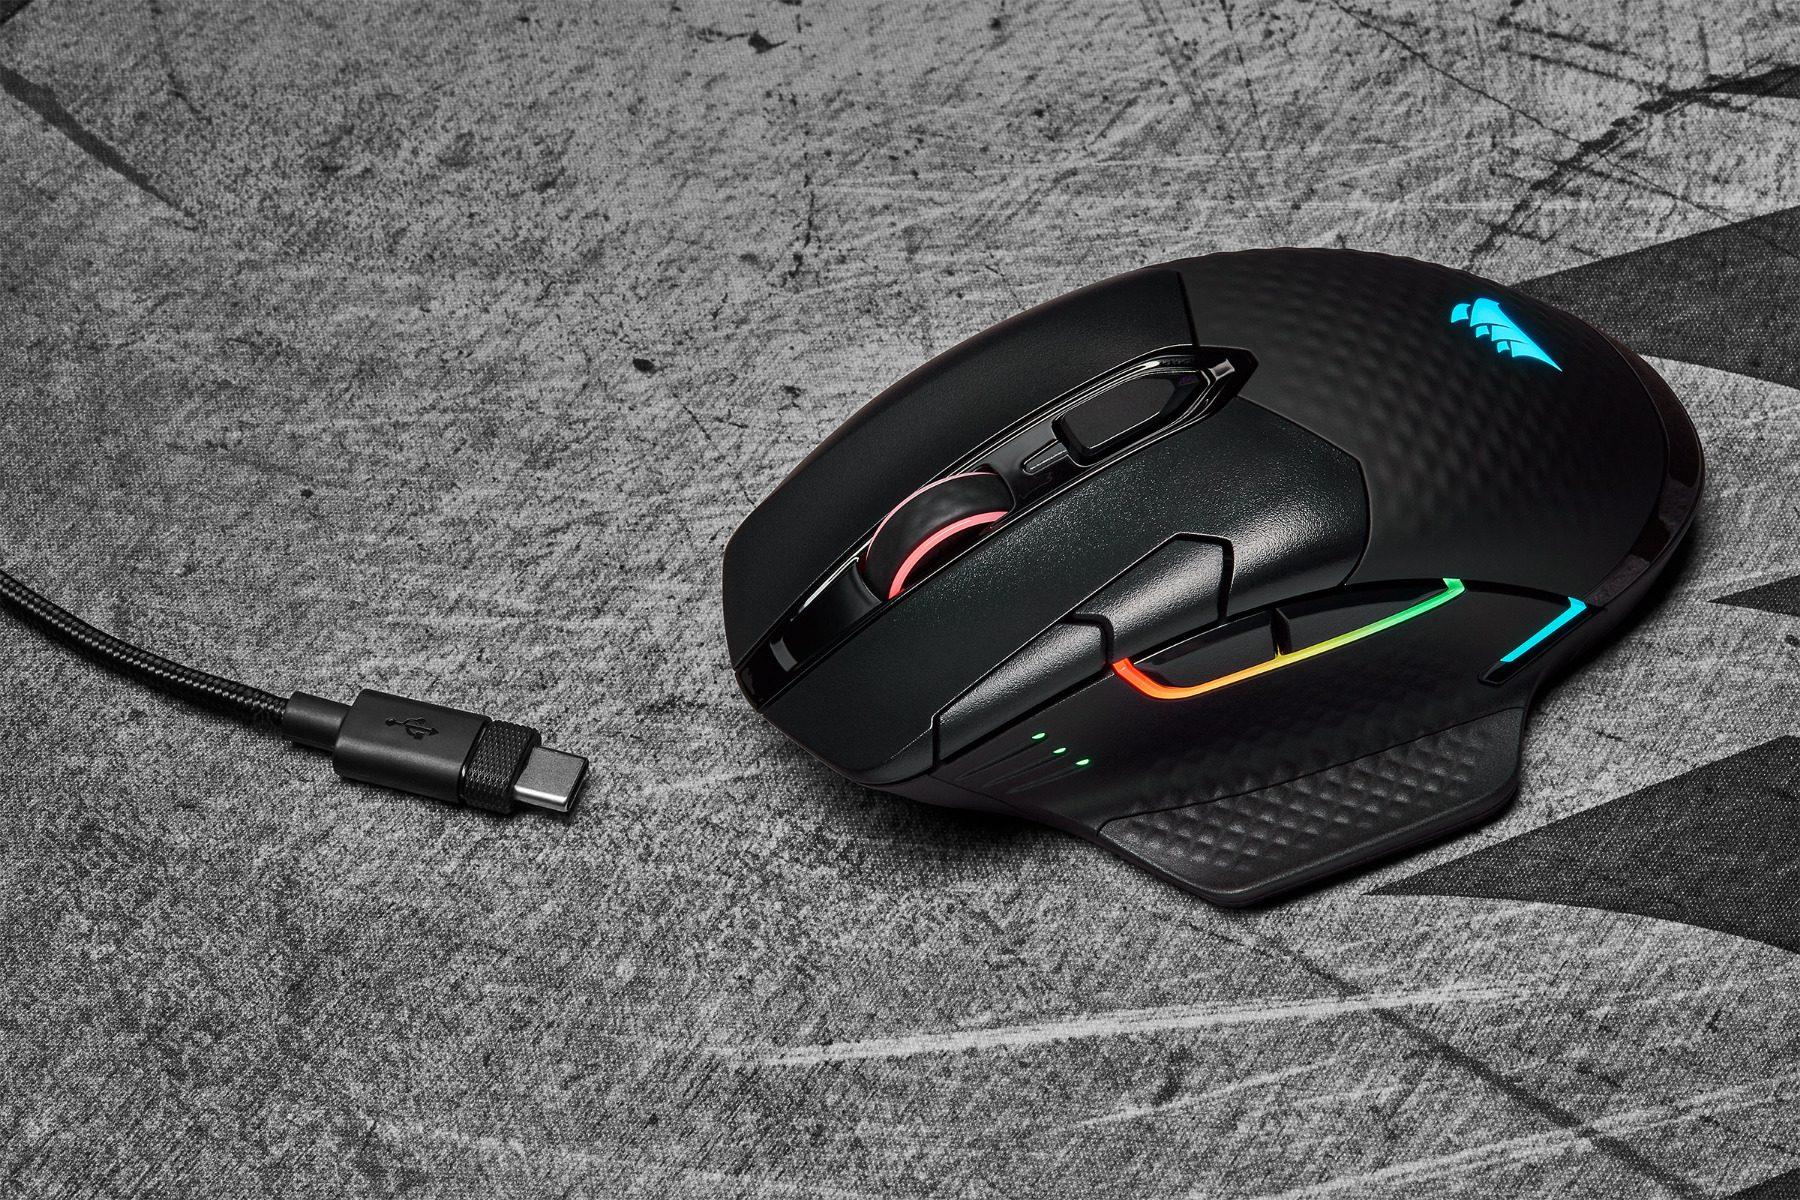 5 corsair dark core rgb pro se kablosuz gaming mouse 5467 - Corsair Dark Core RGB Pro SE Kablosuz Gaming Mouse